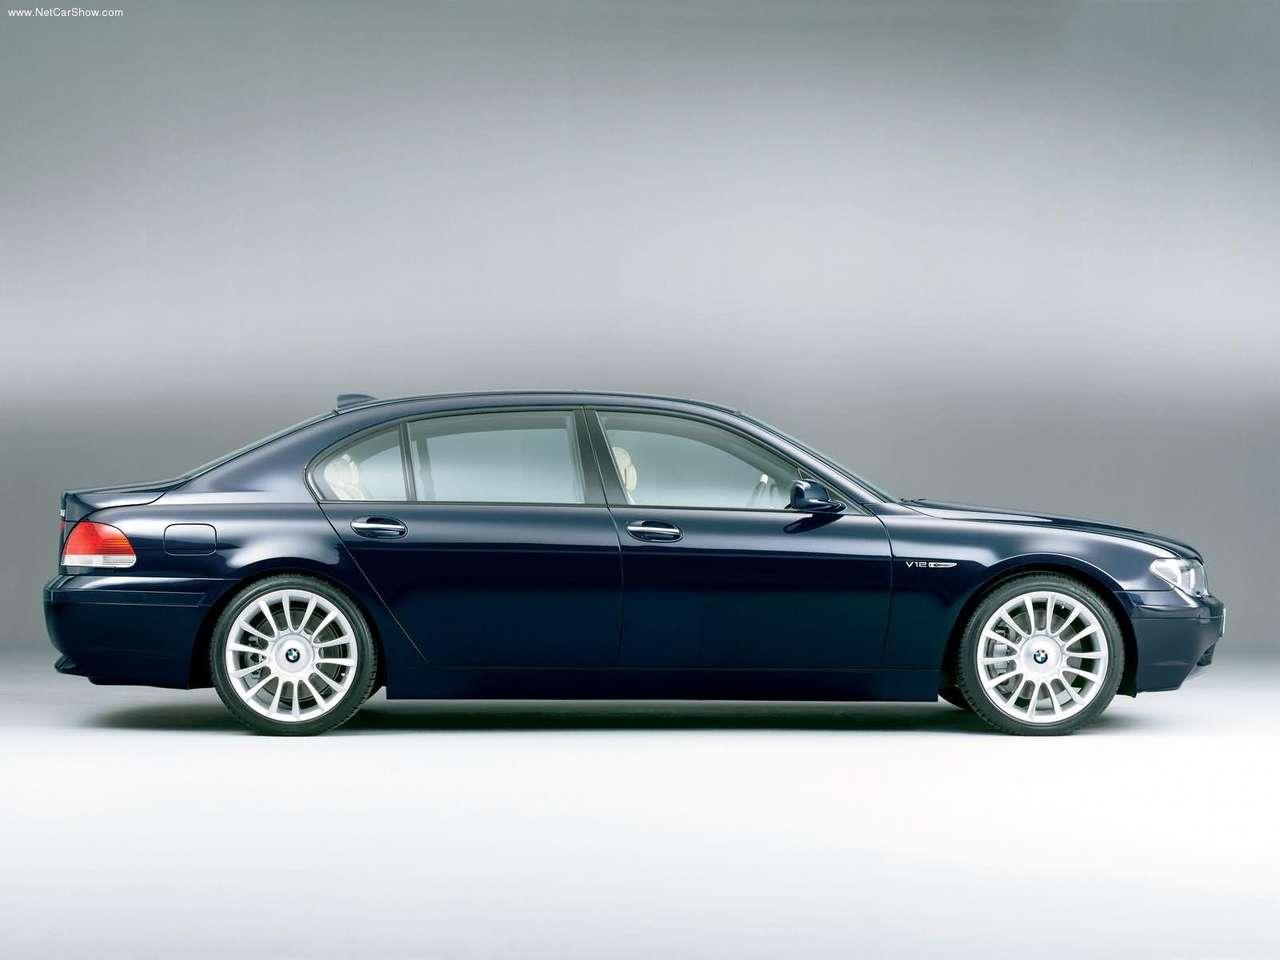 http://4.bp.blogspot.com/_xhqjRo6NERQ/S68c-gCkUsI/AAAAAAAAGZM/X0hFQmR3CkE/s1600/BMW-760Li_Yachtline_Concept_2002_1280x960_wallpaper_02.jpg